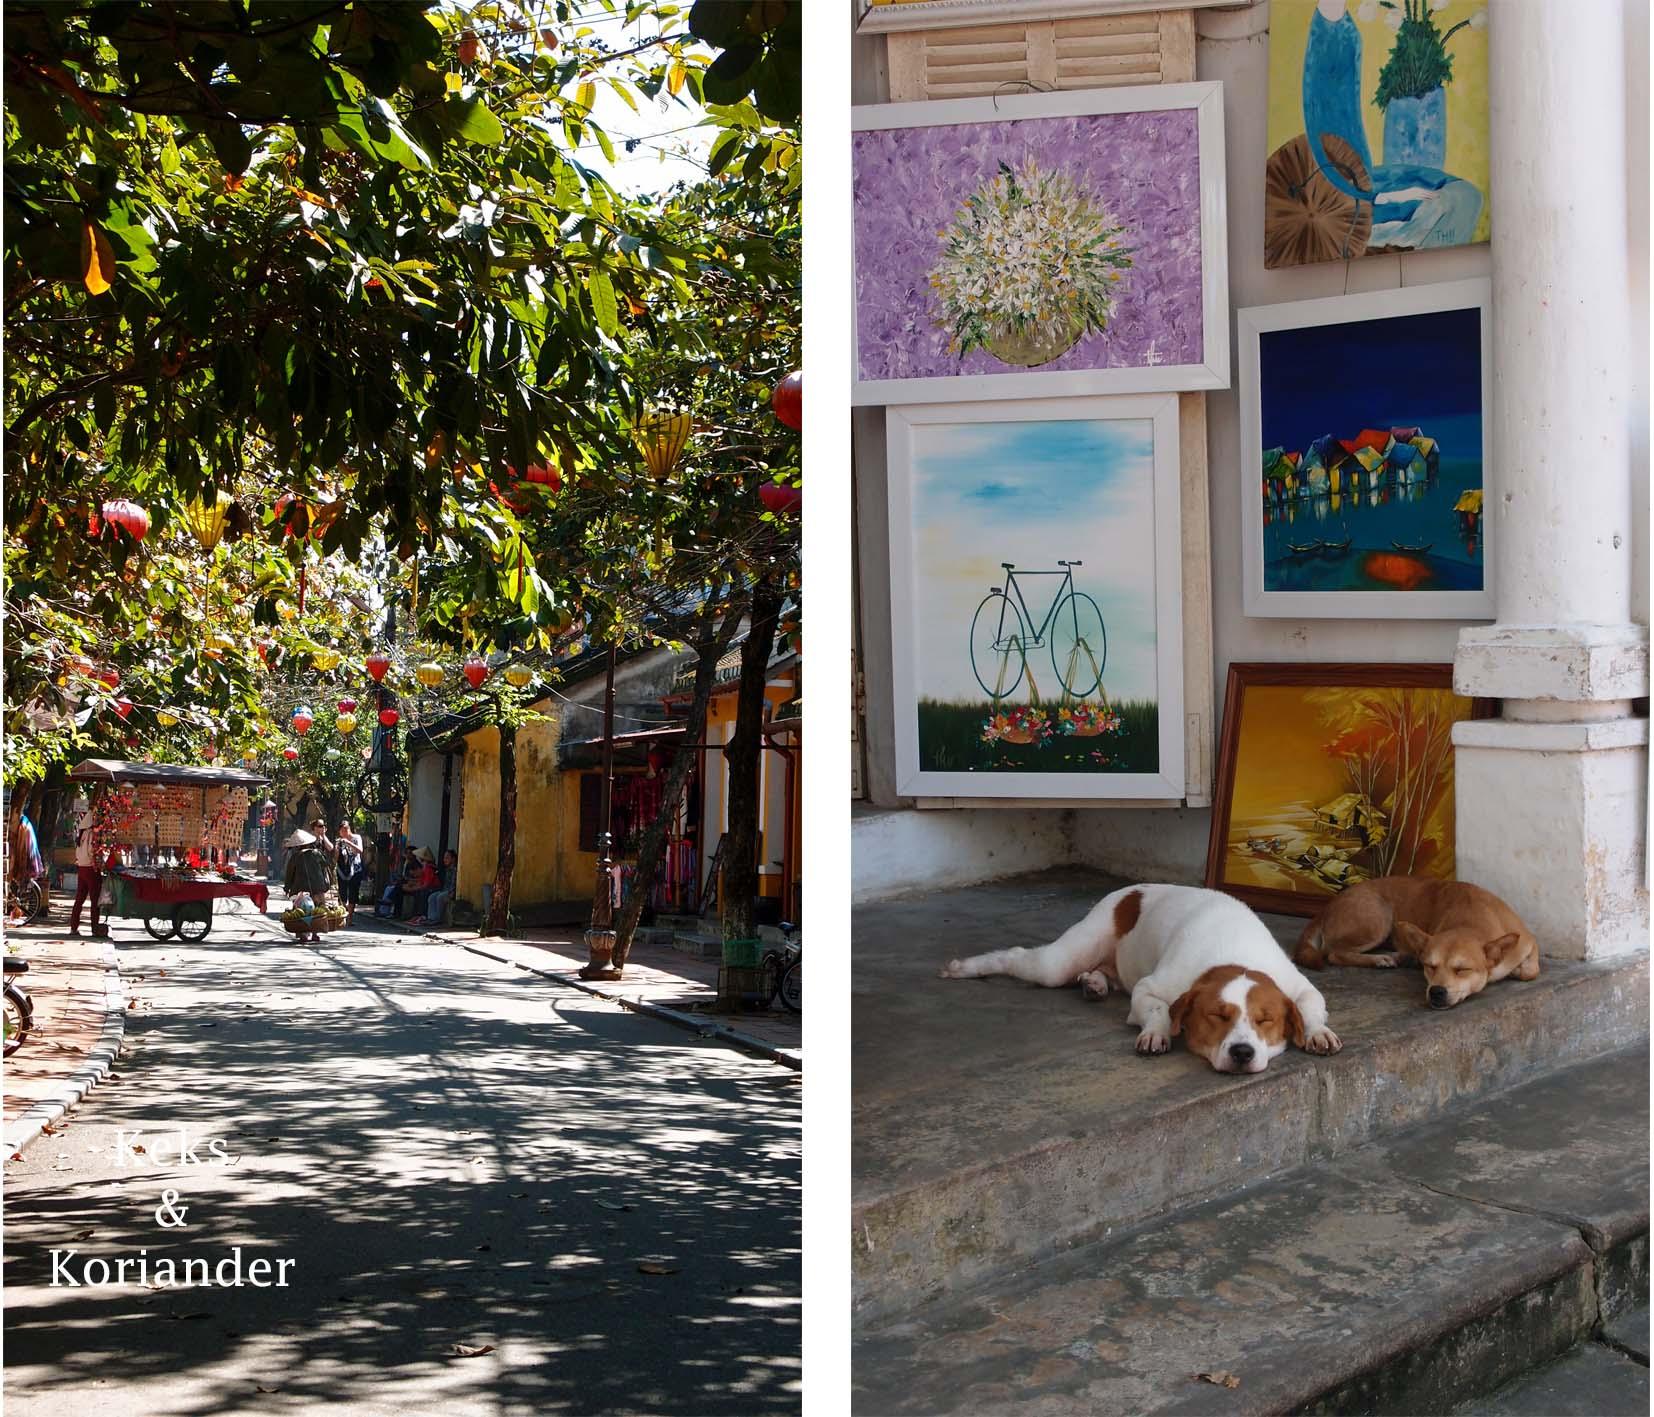 Hoi An Vietnam alte Häuser Lampions Hunde